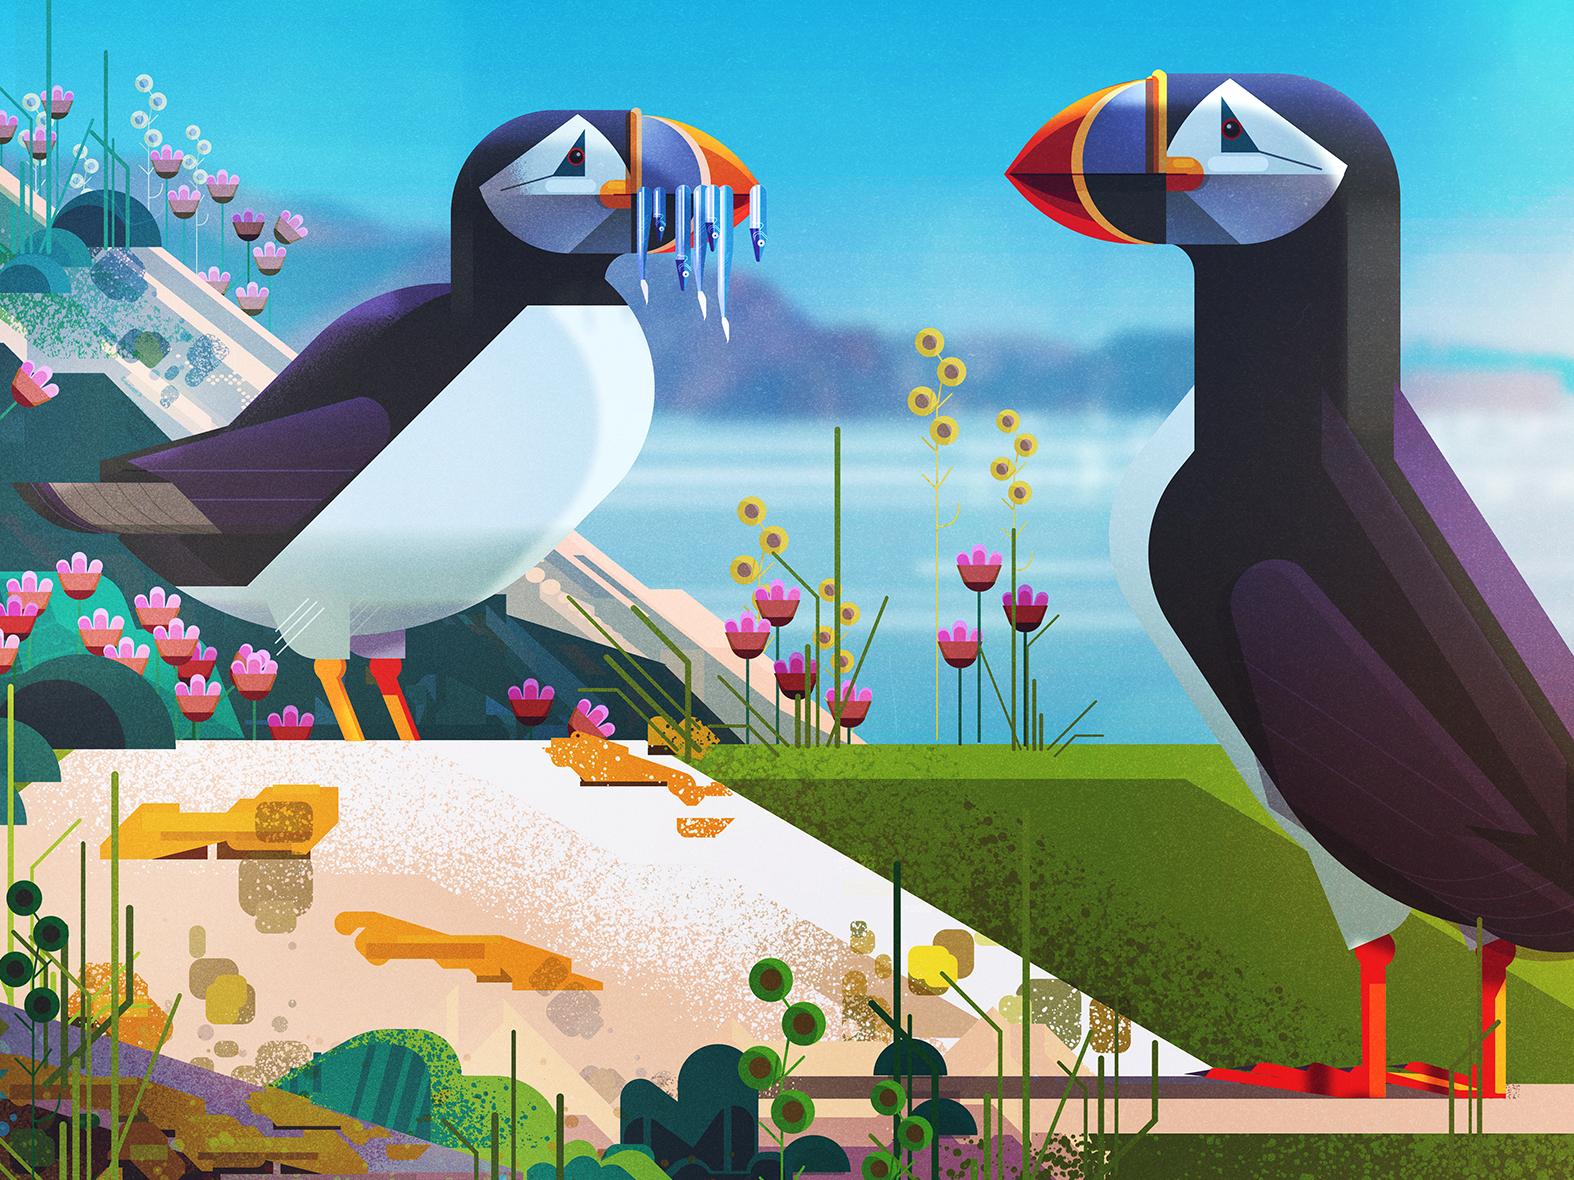 Puffin spread detail from Saving Species book endangered species animals illustrator geometric digital vector illustration james gilleard